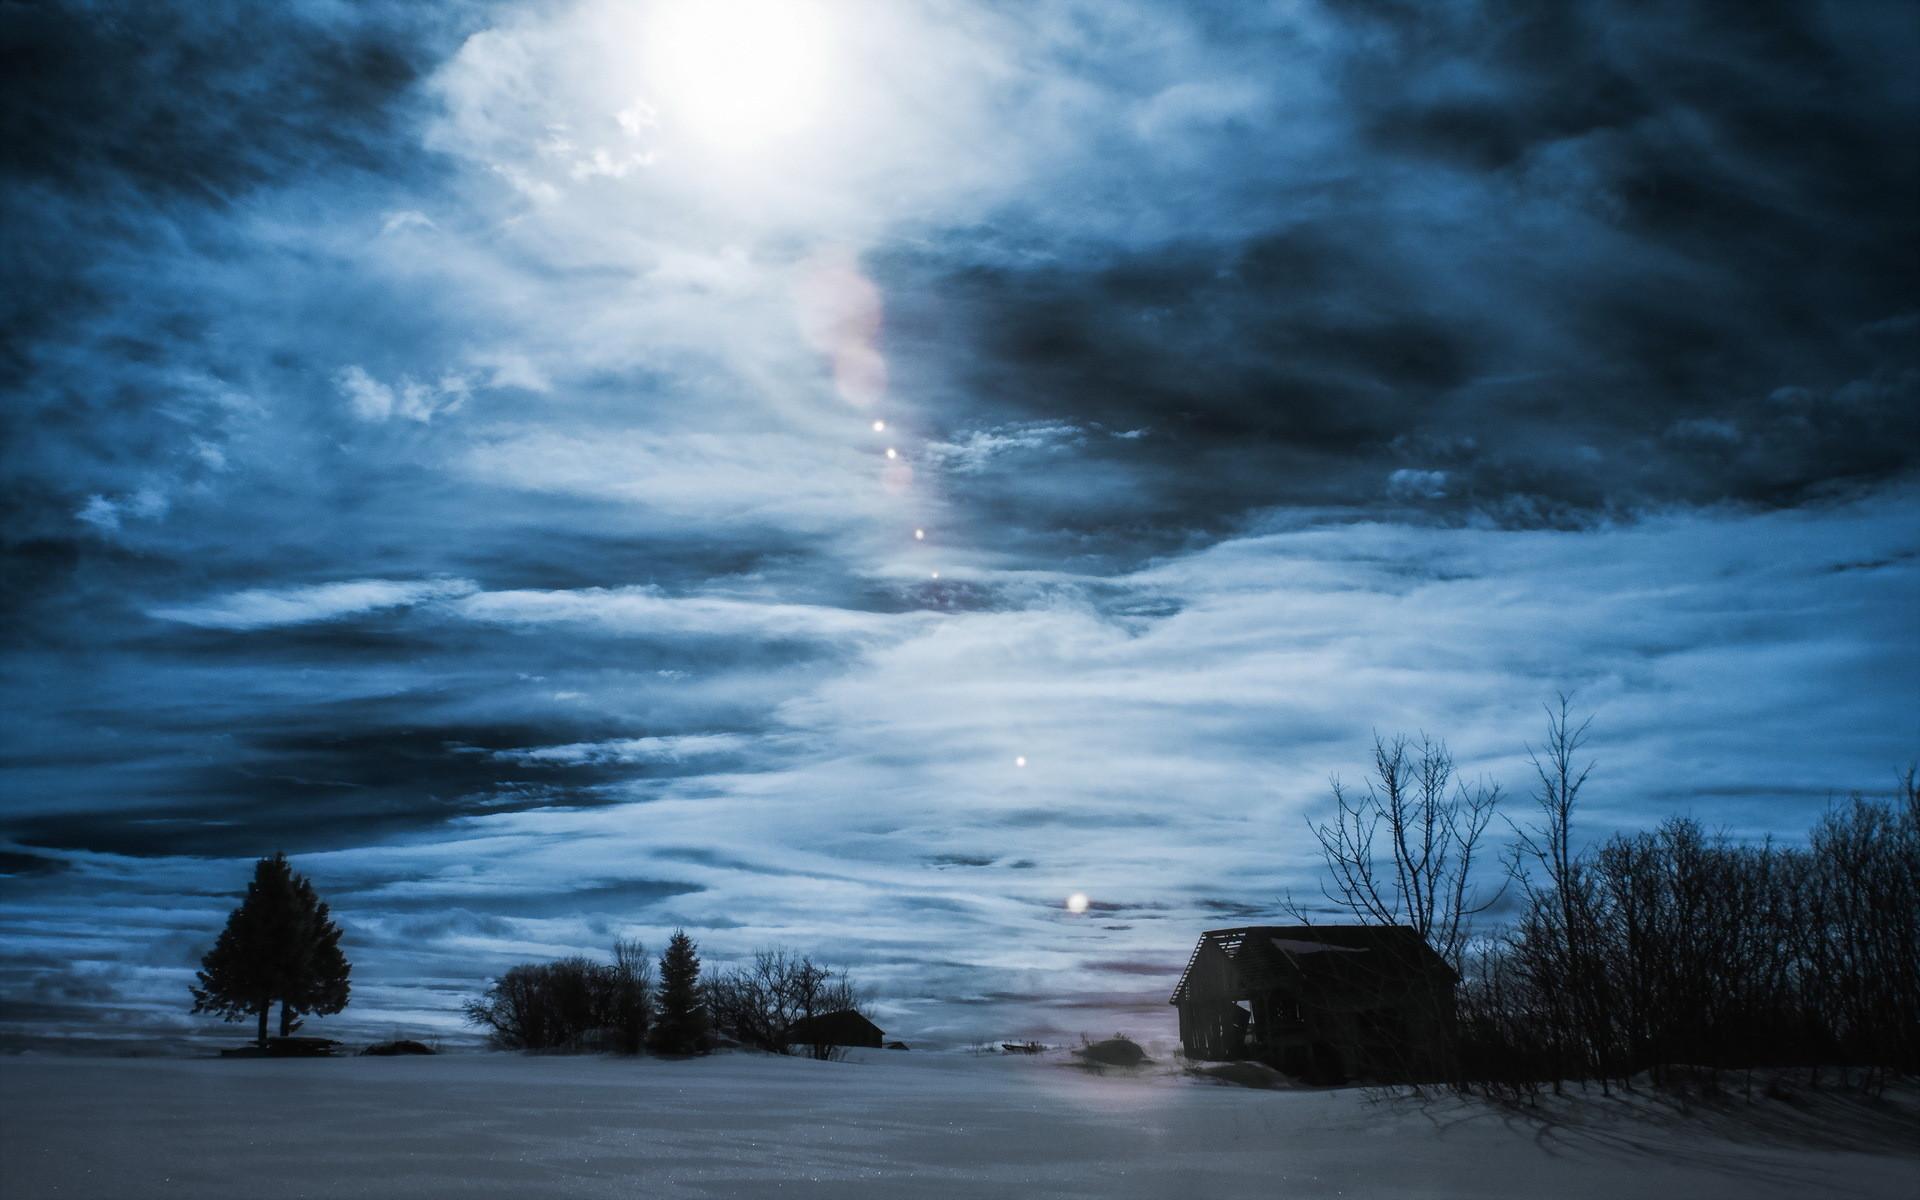 Night winter house landscape clouds sky wallpaper | | 136630 |  WallpaperUP